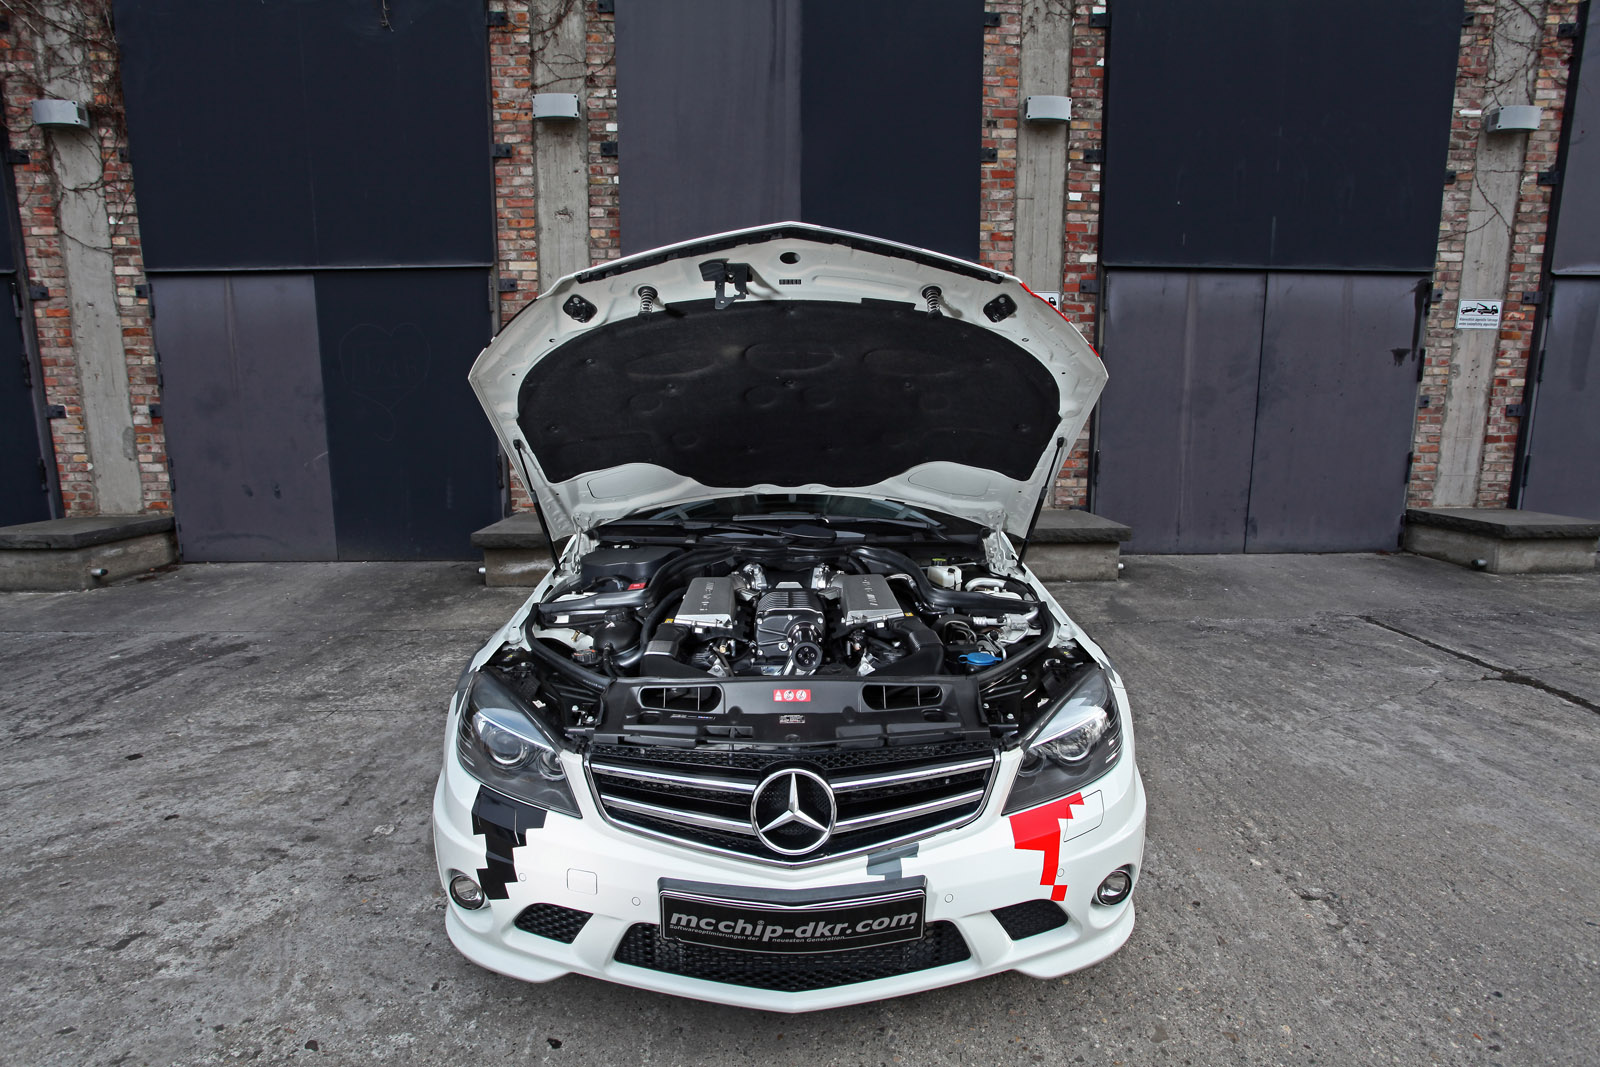 mcchip-dkr Mercedes-Benz C63 AMG